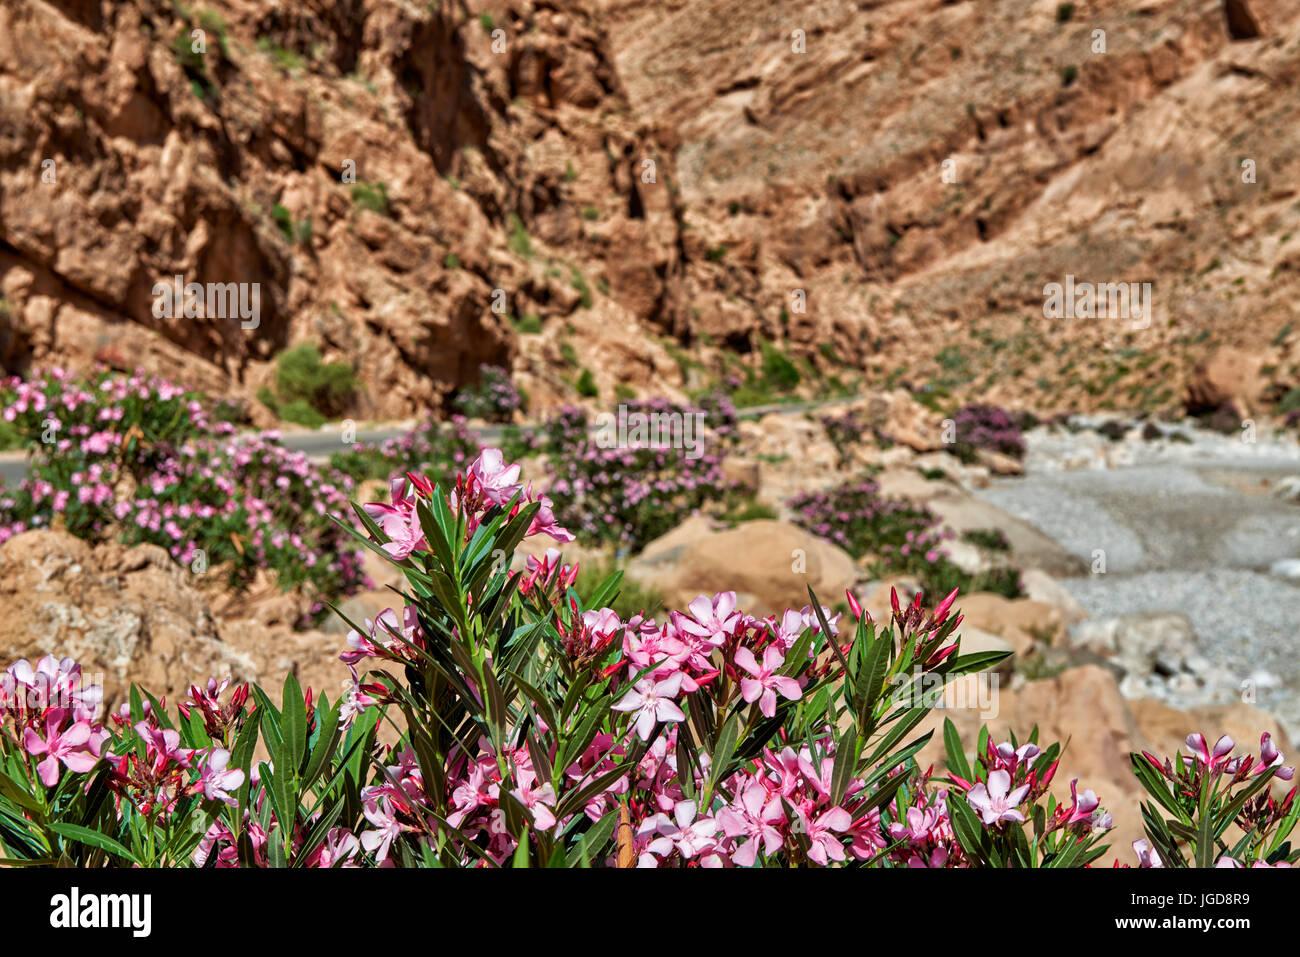 oberer Teil der Todra-Schlucht, Tinghir, Marokko, Afrika  upper part of Todgha Gorge,  Tinghir, Morocco, Africa  Stock Photo